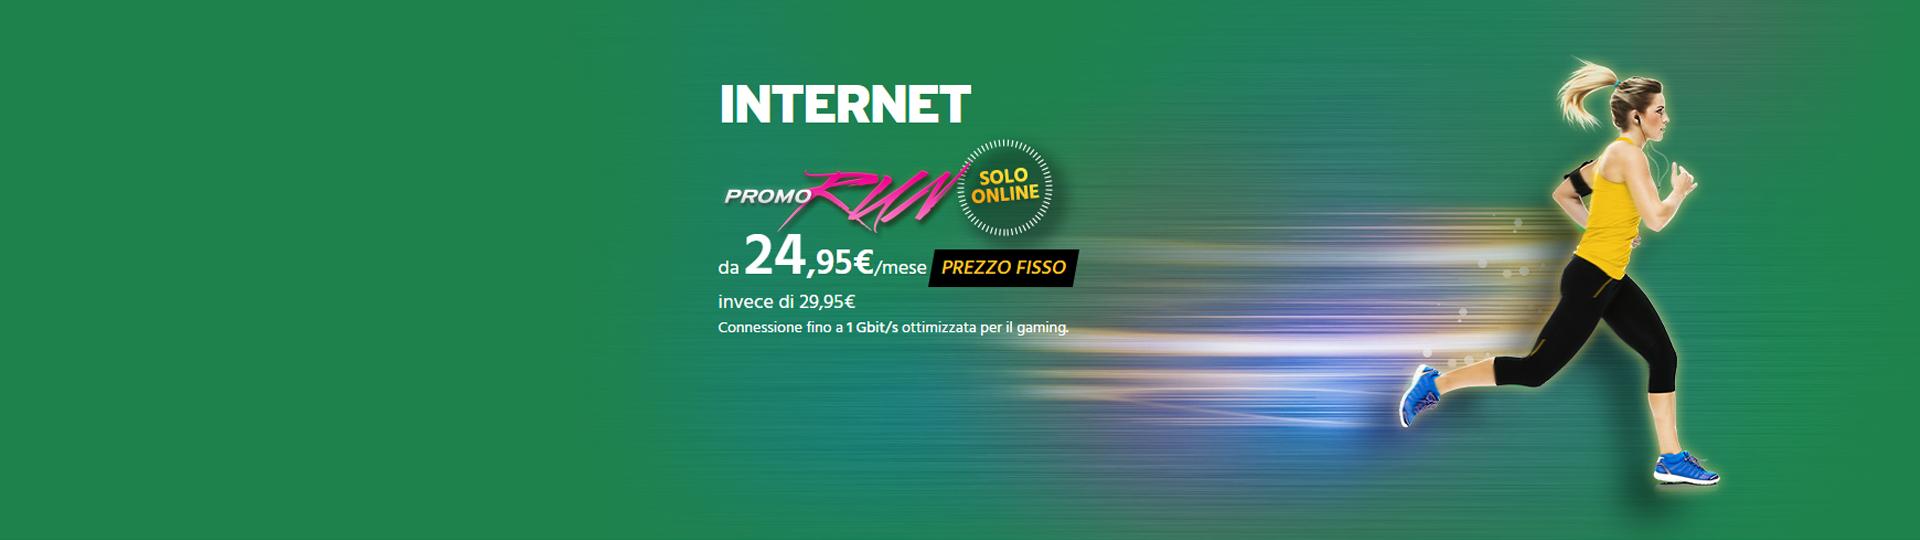 Internet promo RUN